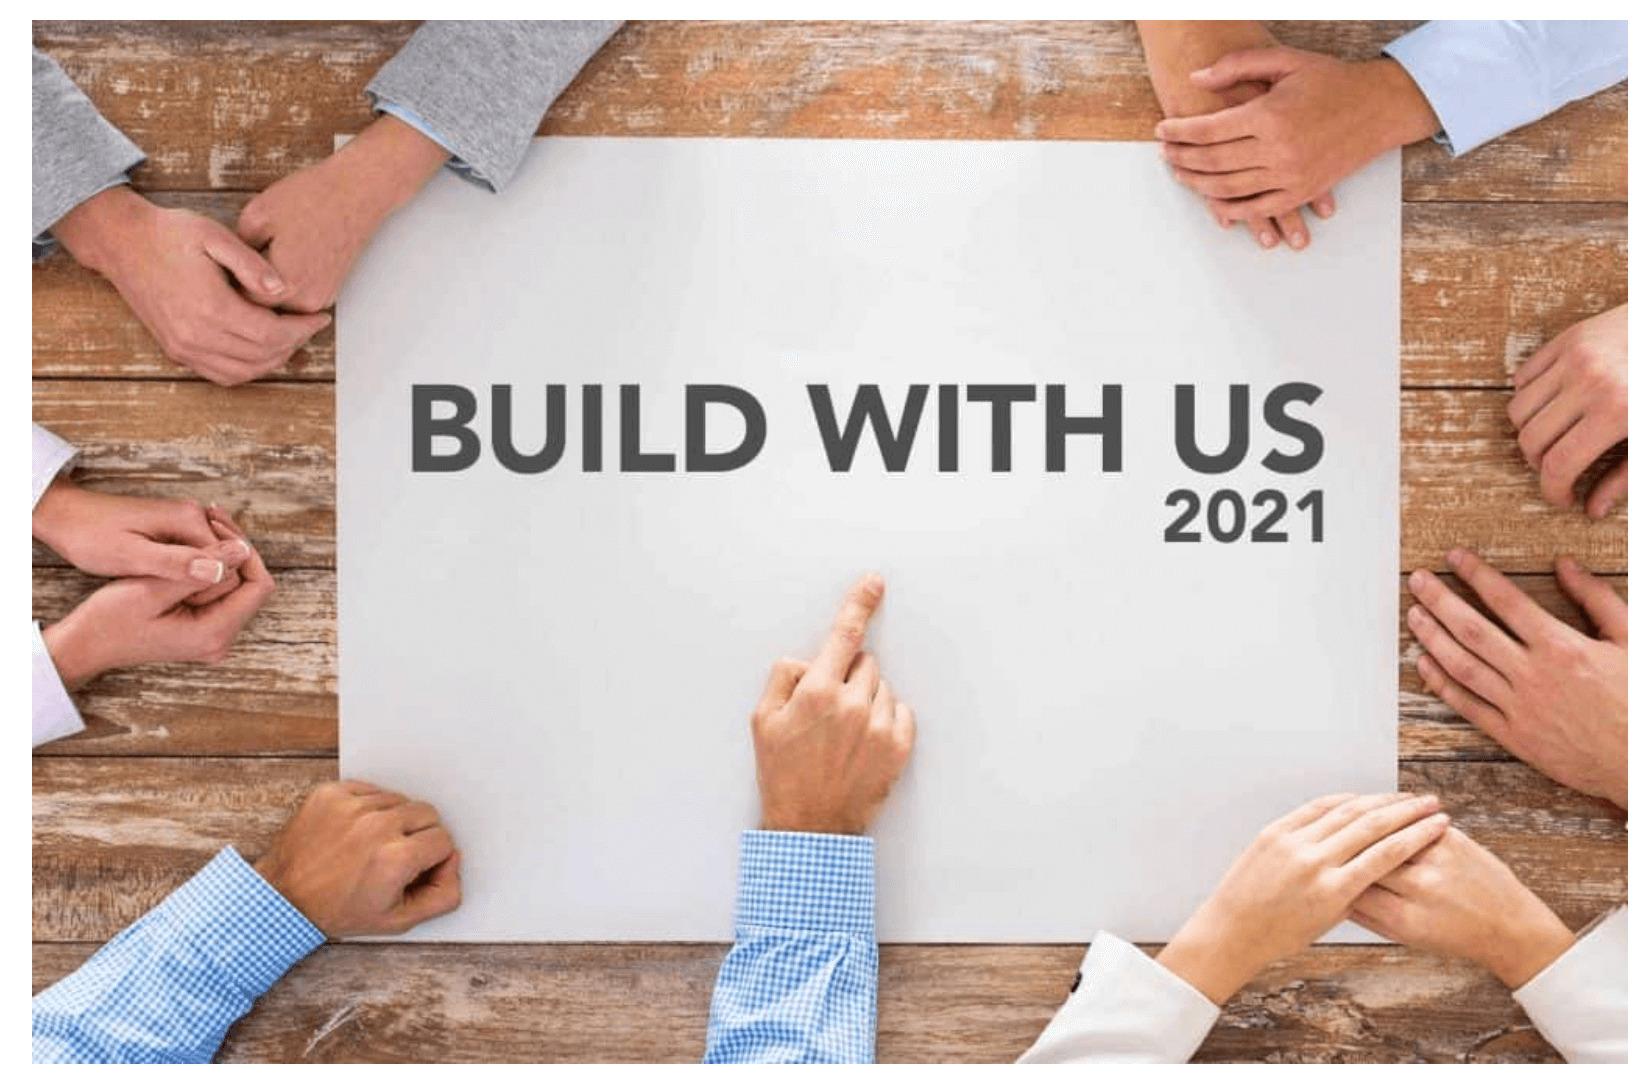 build-with-us-challenge